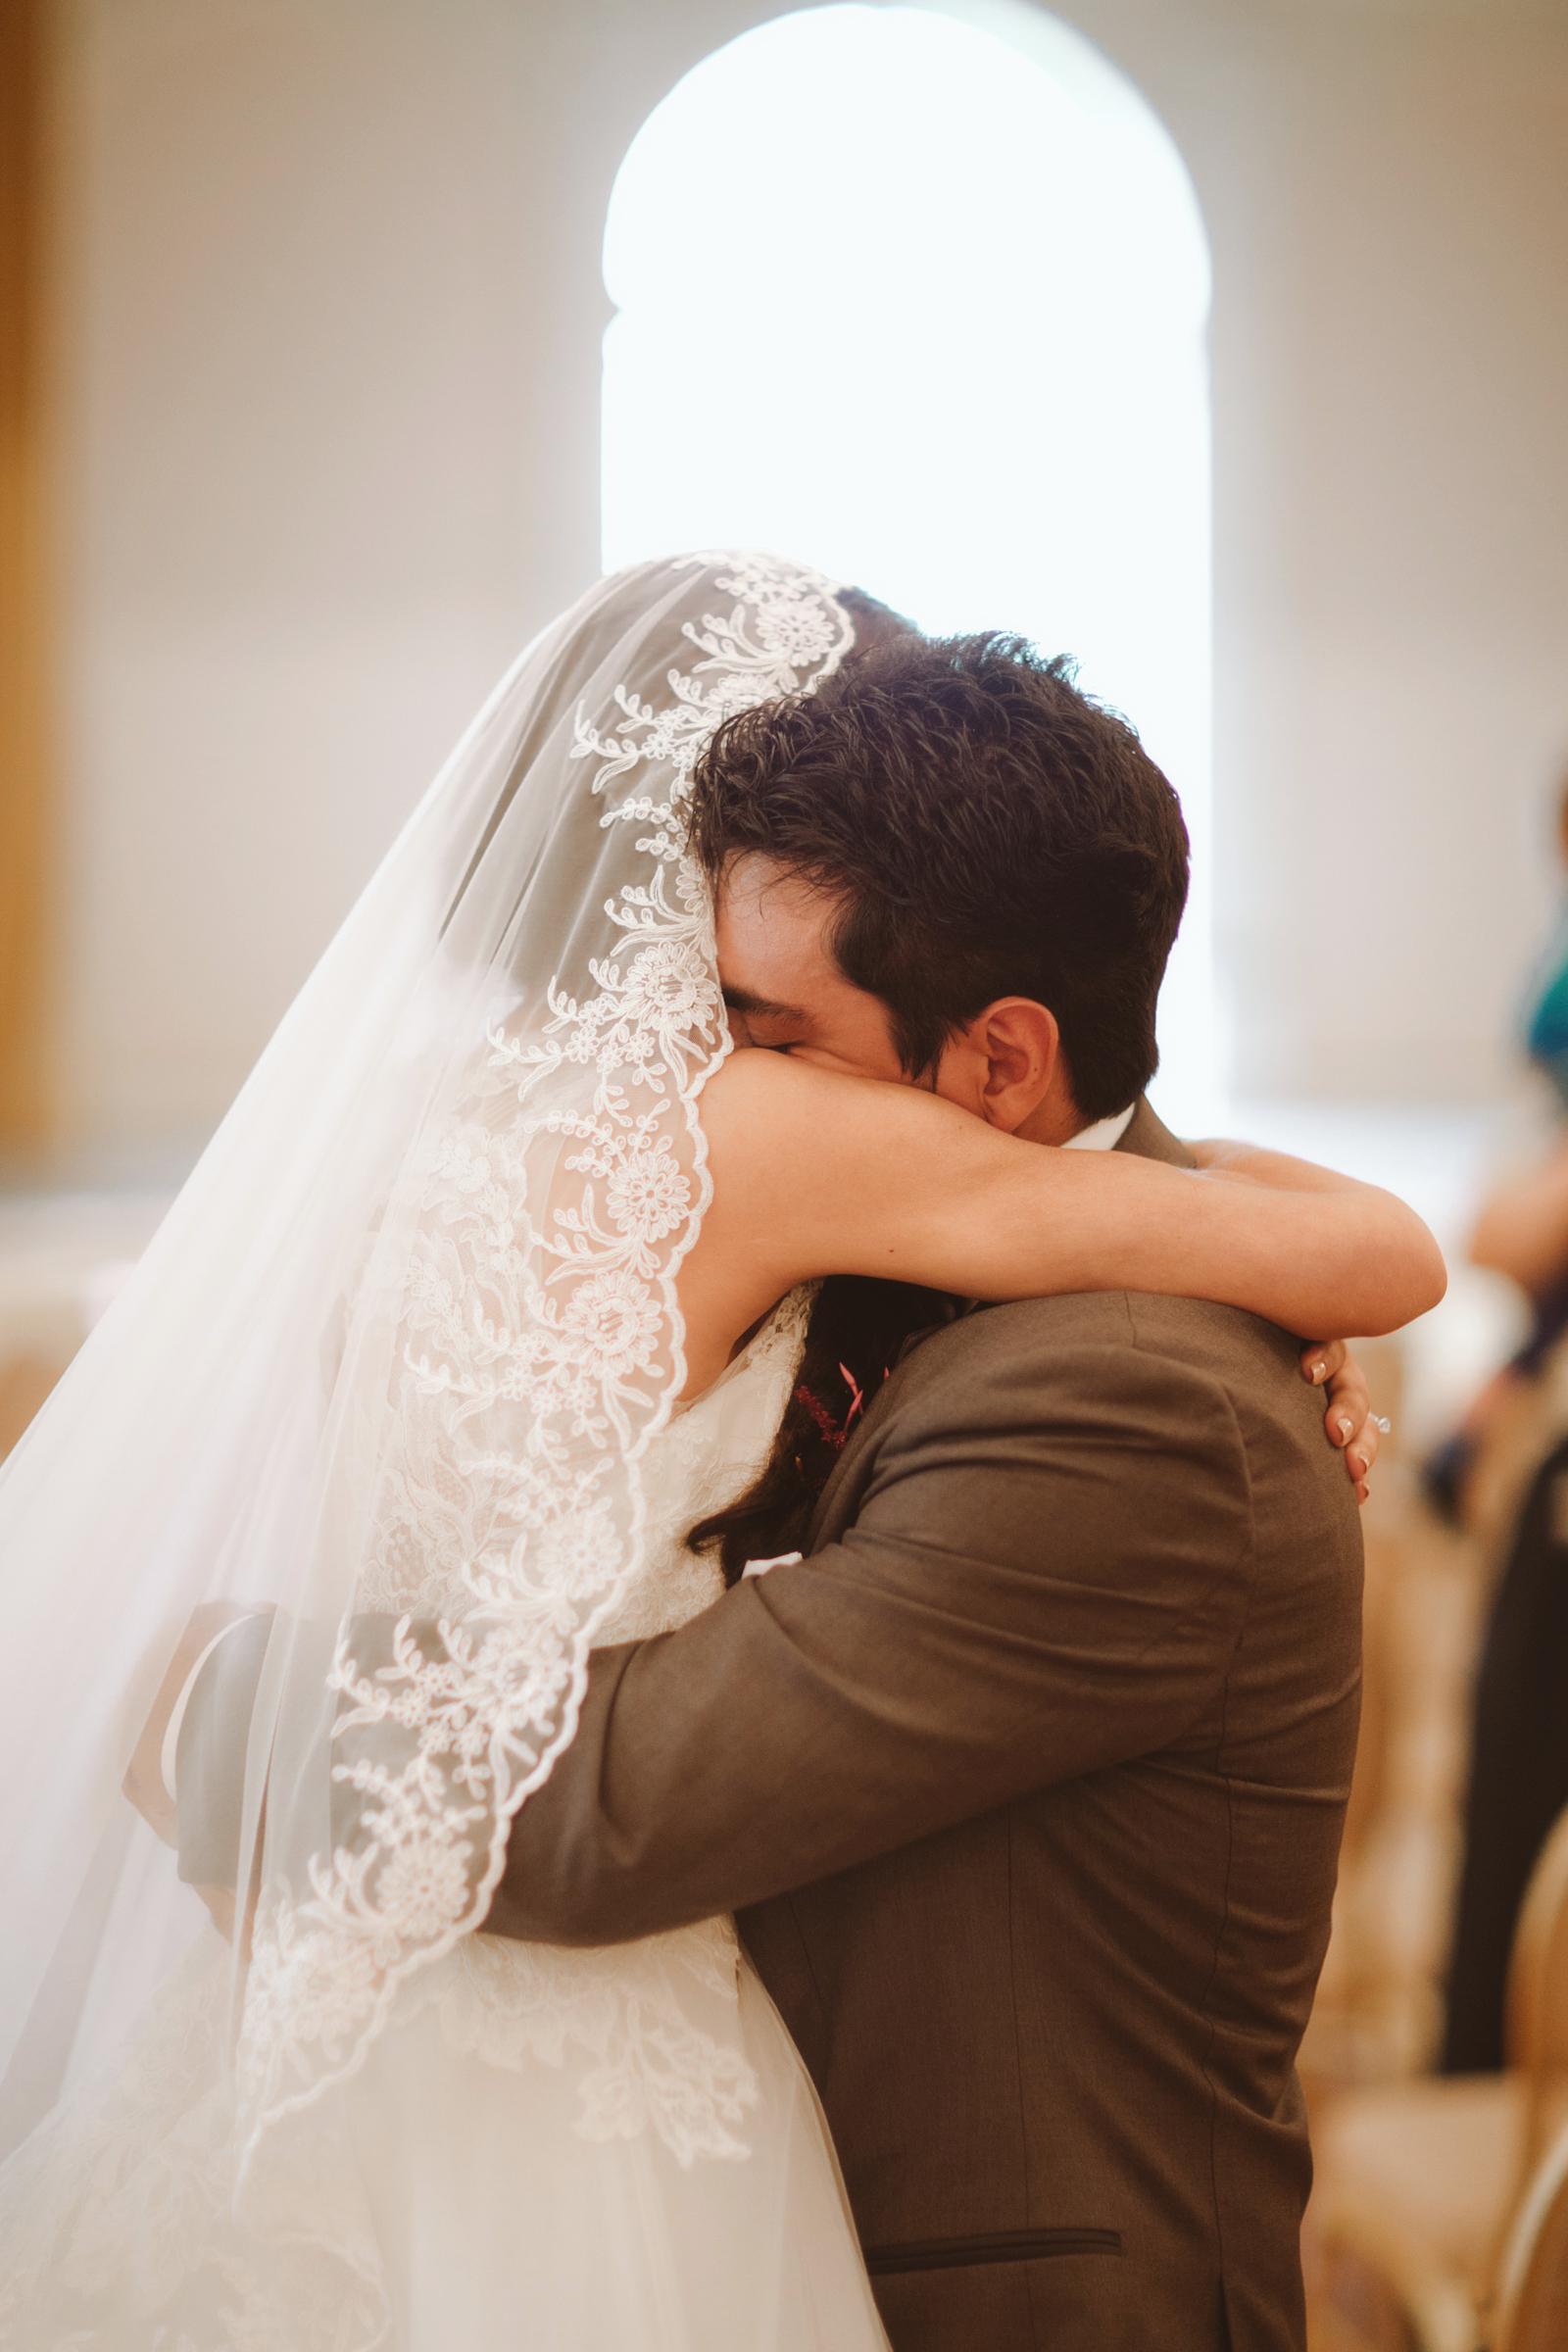 wedding day | MFA St Pete | Vanessa Boy Photography | vanessaboy.com-393.com |final.jpg